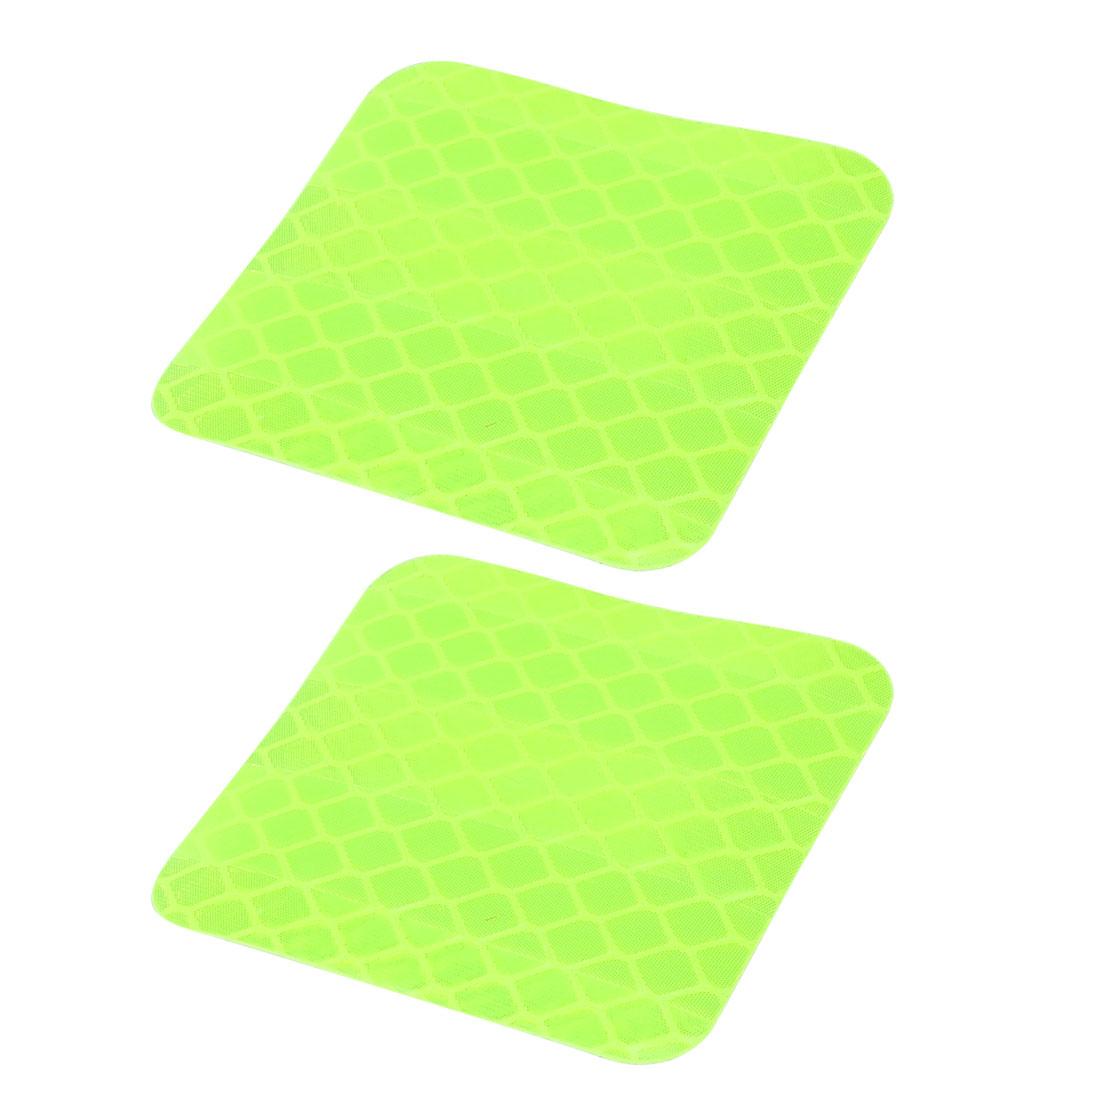 2pcs Honeycomb Reflective Warning Tape Film Sticker Light Yellow 40mm x 40mm